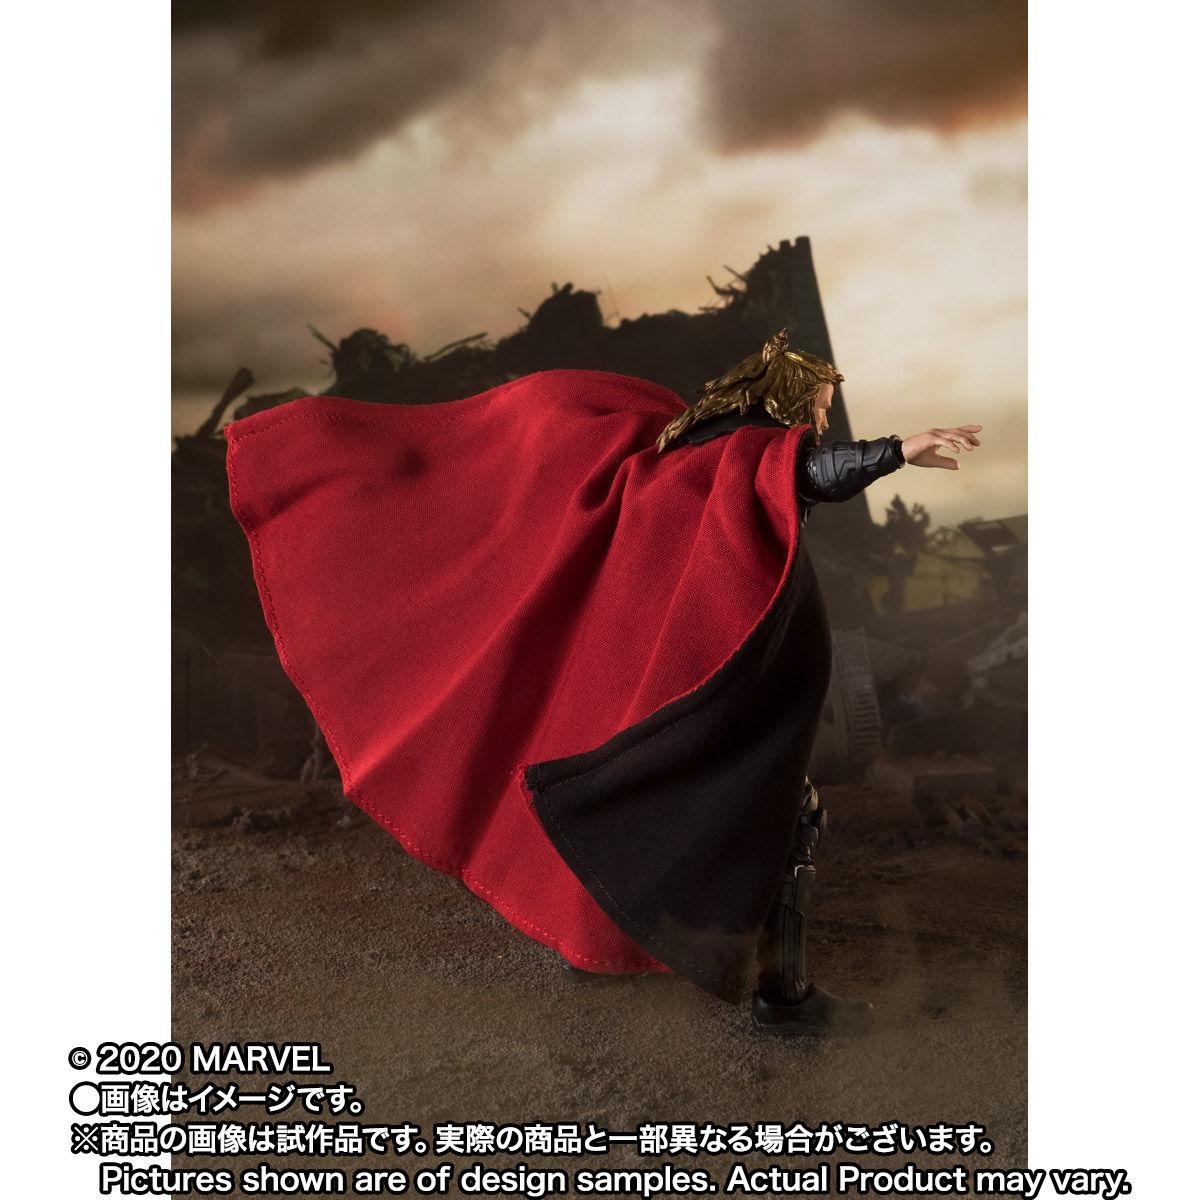 S.H.フィギュアーツ ソー FINAL BATTLE EDITION